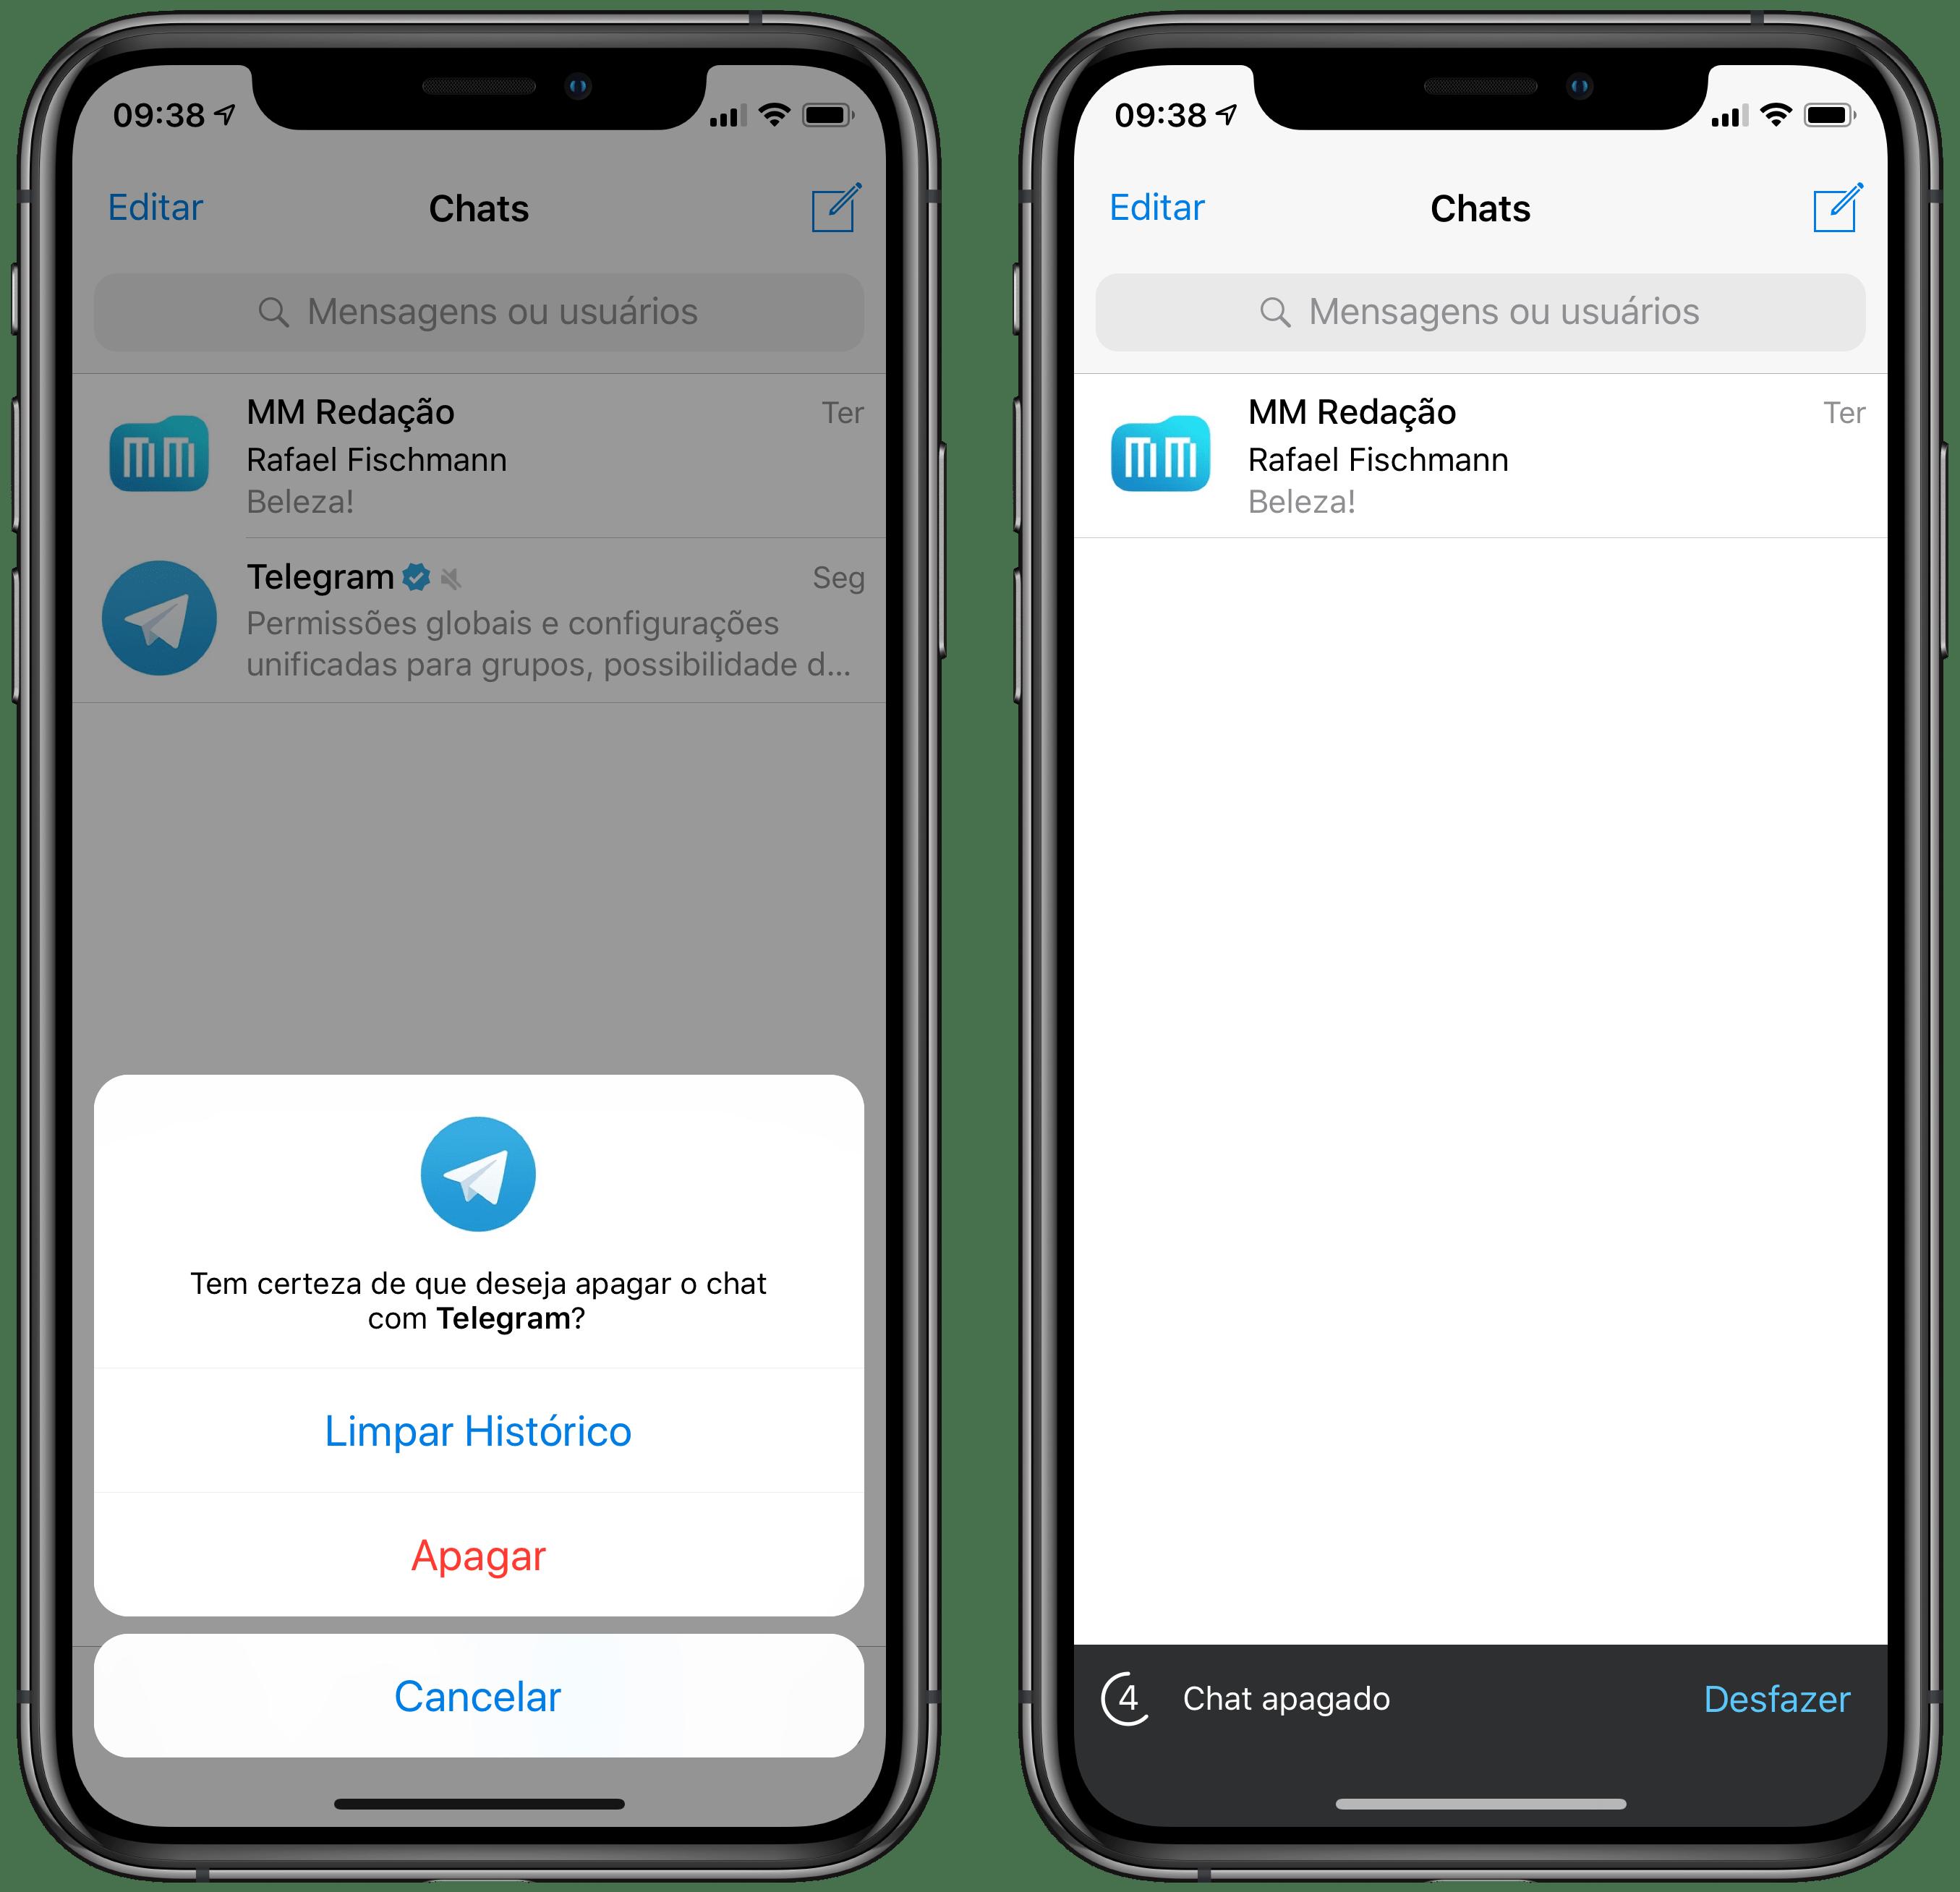 Recuperar mensagens no Telegram